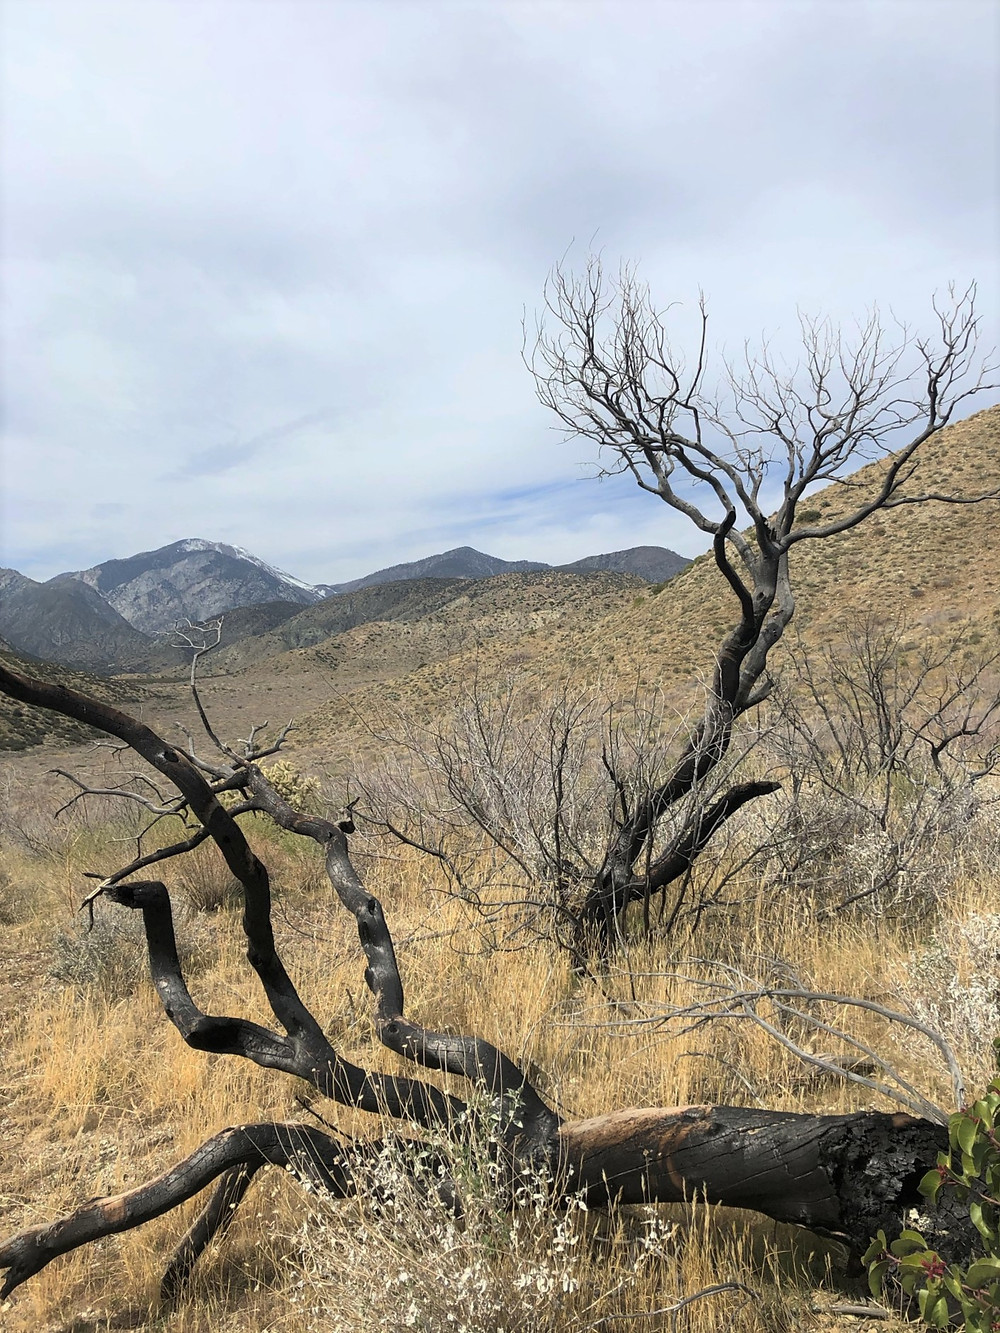 Hiking PCT in the San Gorgonio Wilderness area